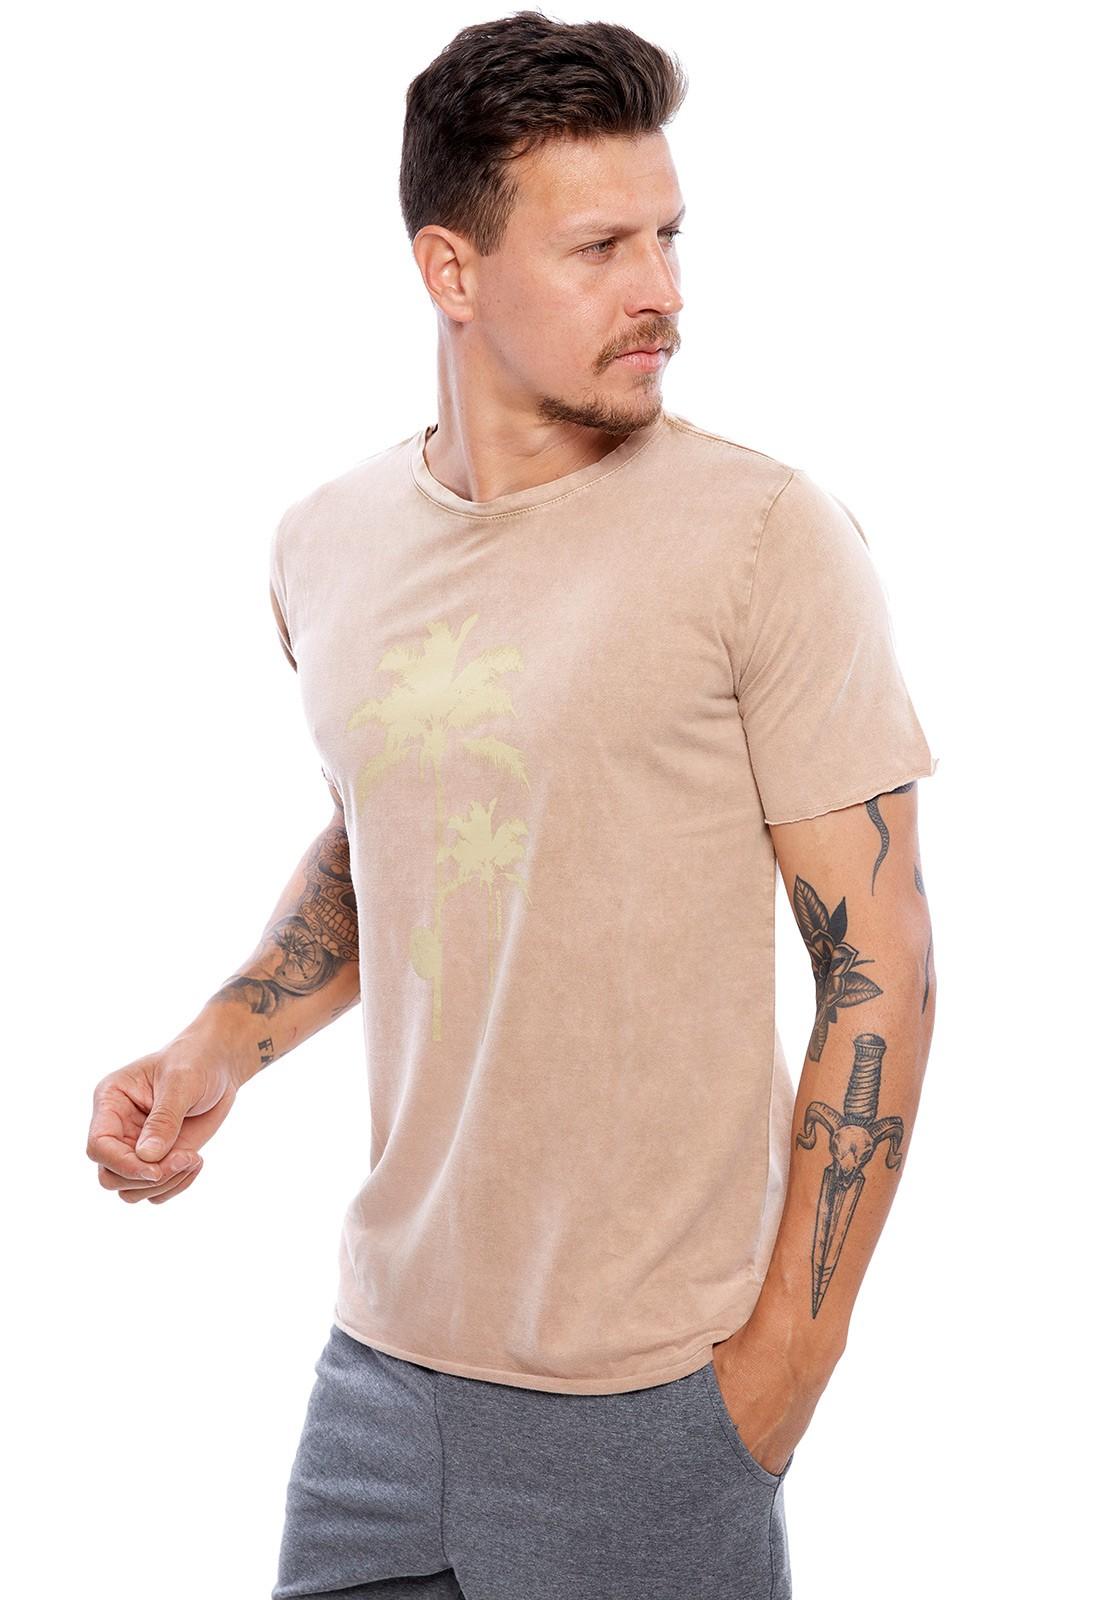 Camiseta Vida Marinha Manga Curta Especial Cáqui